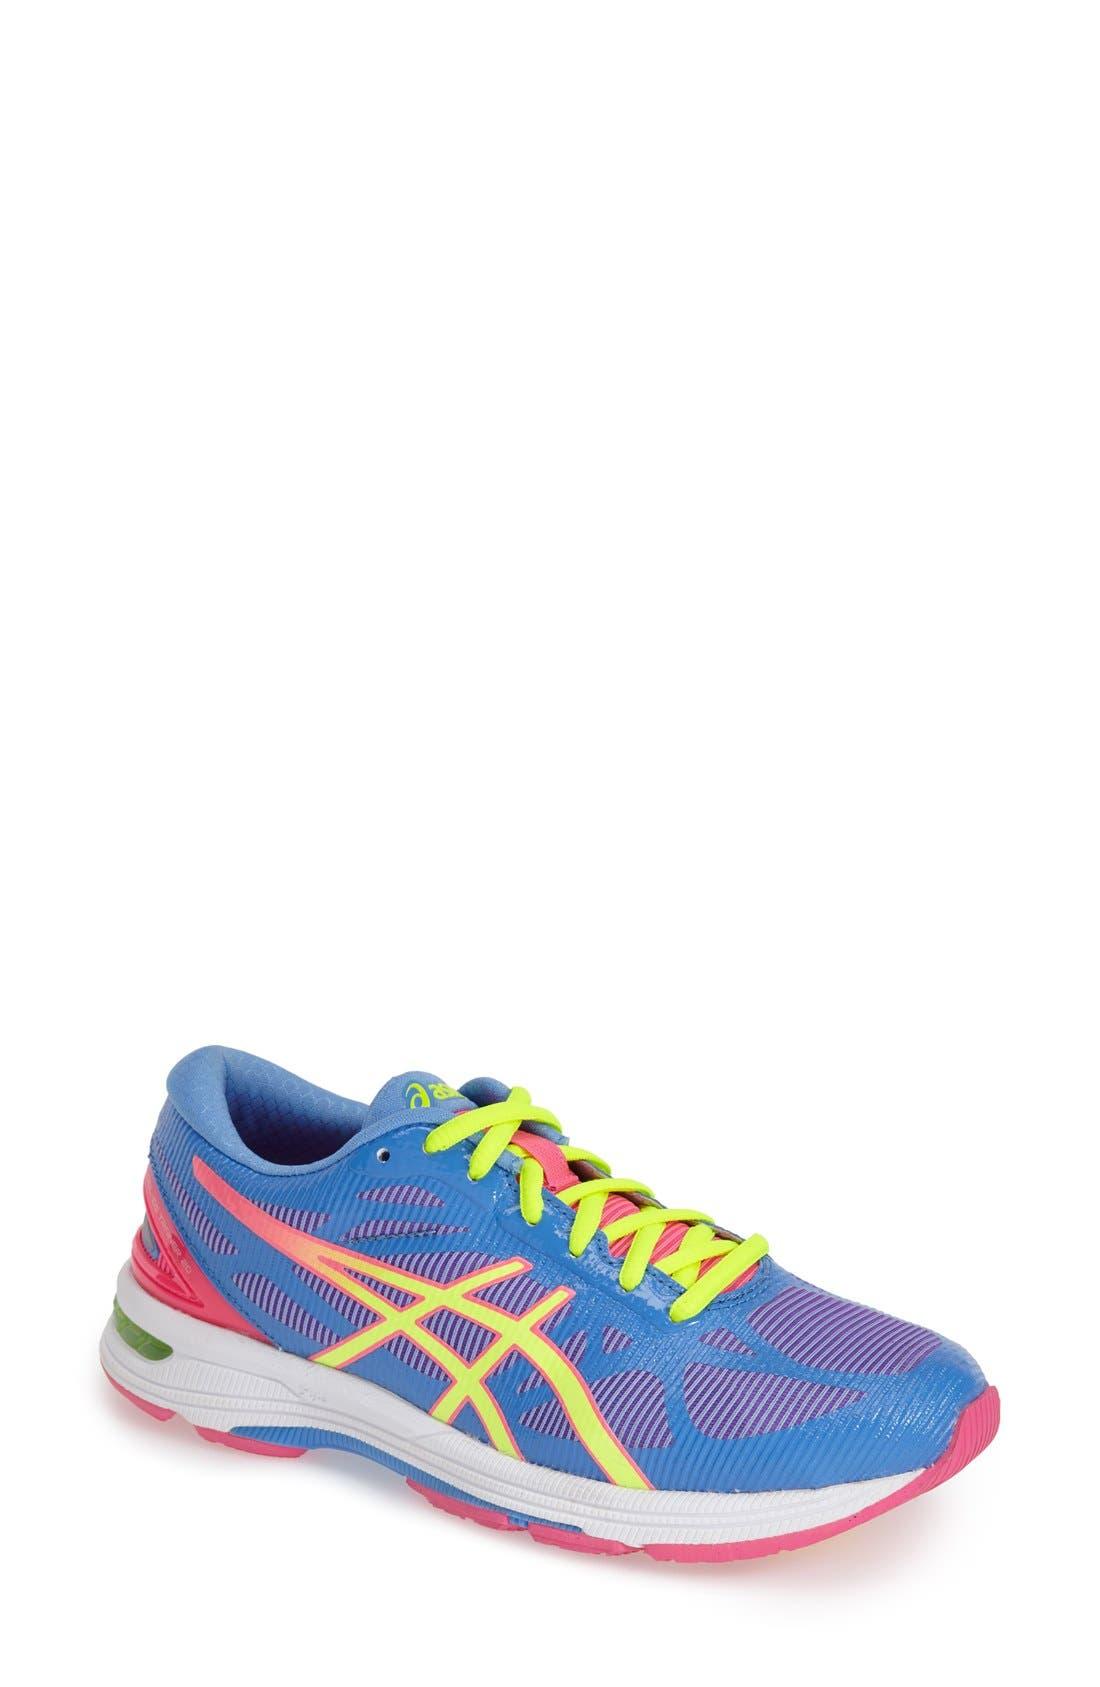 Main Image - ASICS® 'GEL-DS Trainer® 20' Running Shoe (Women)